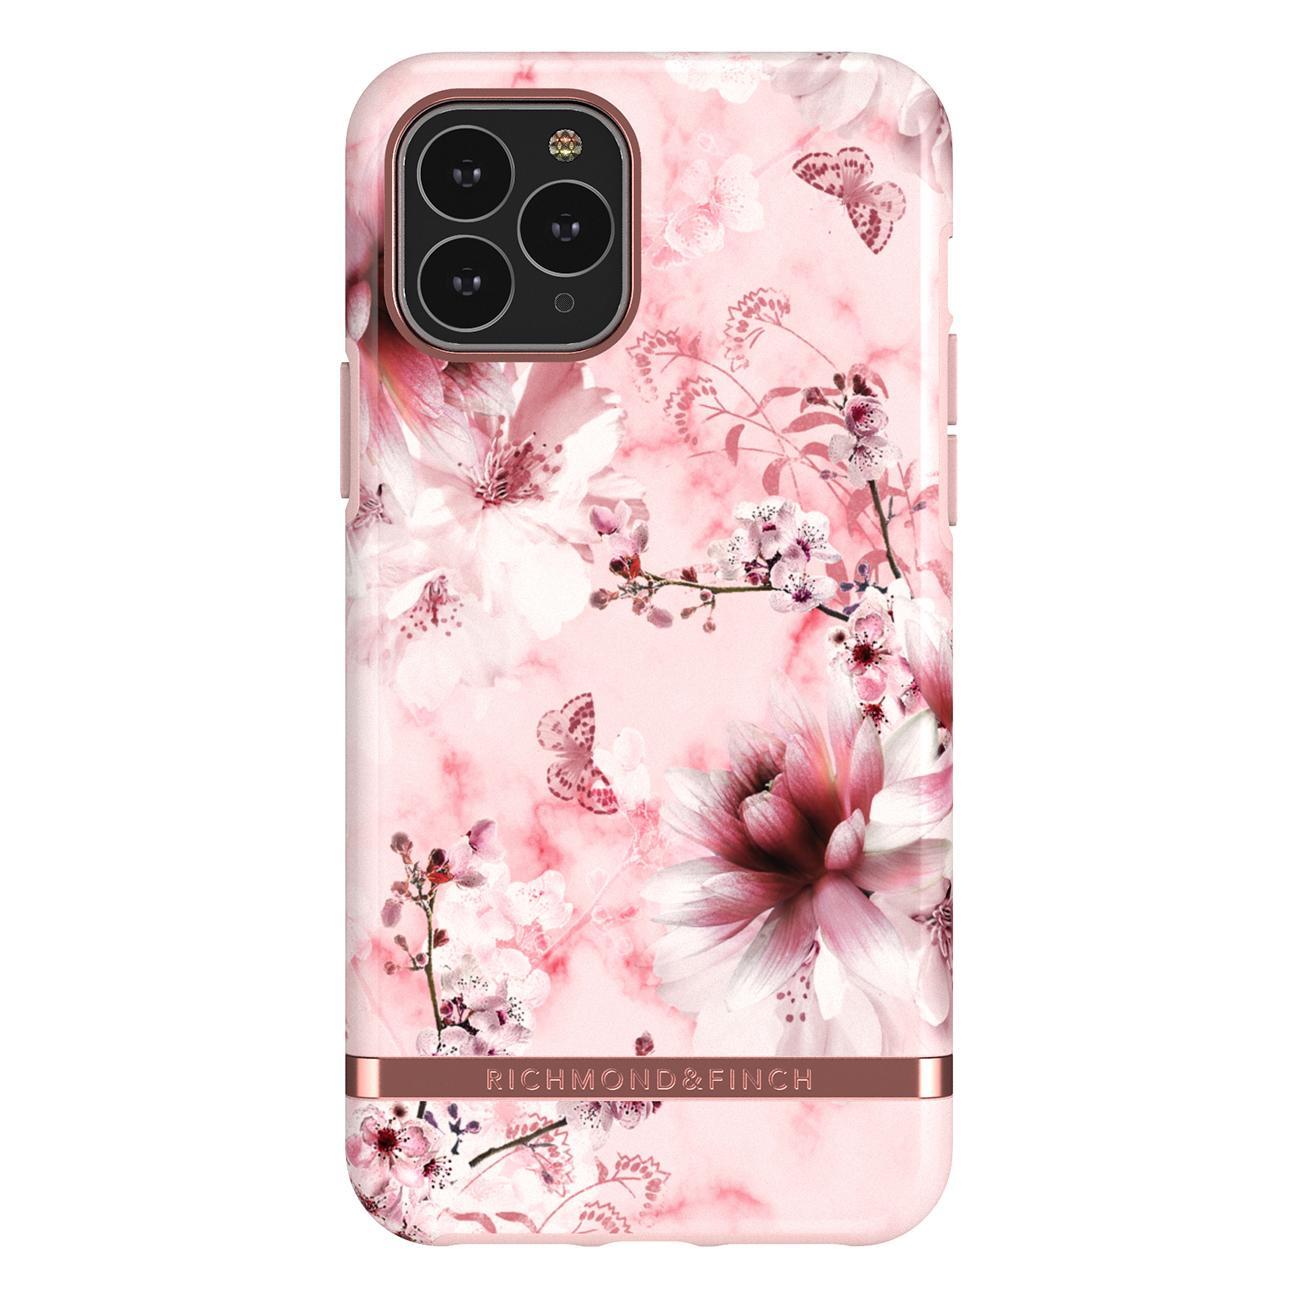 Skal iPhone 11 Pro Pink Marble Floral